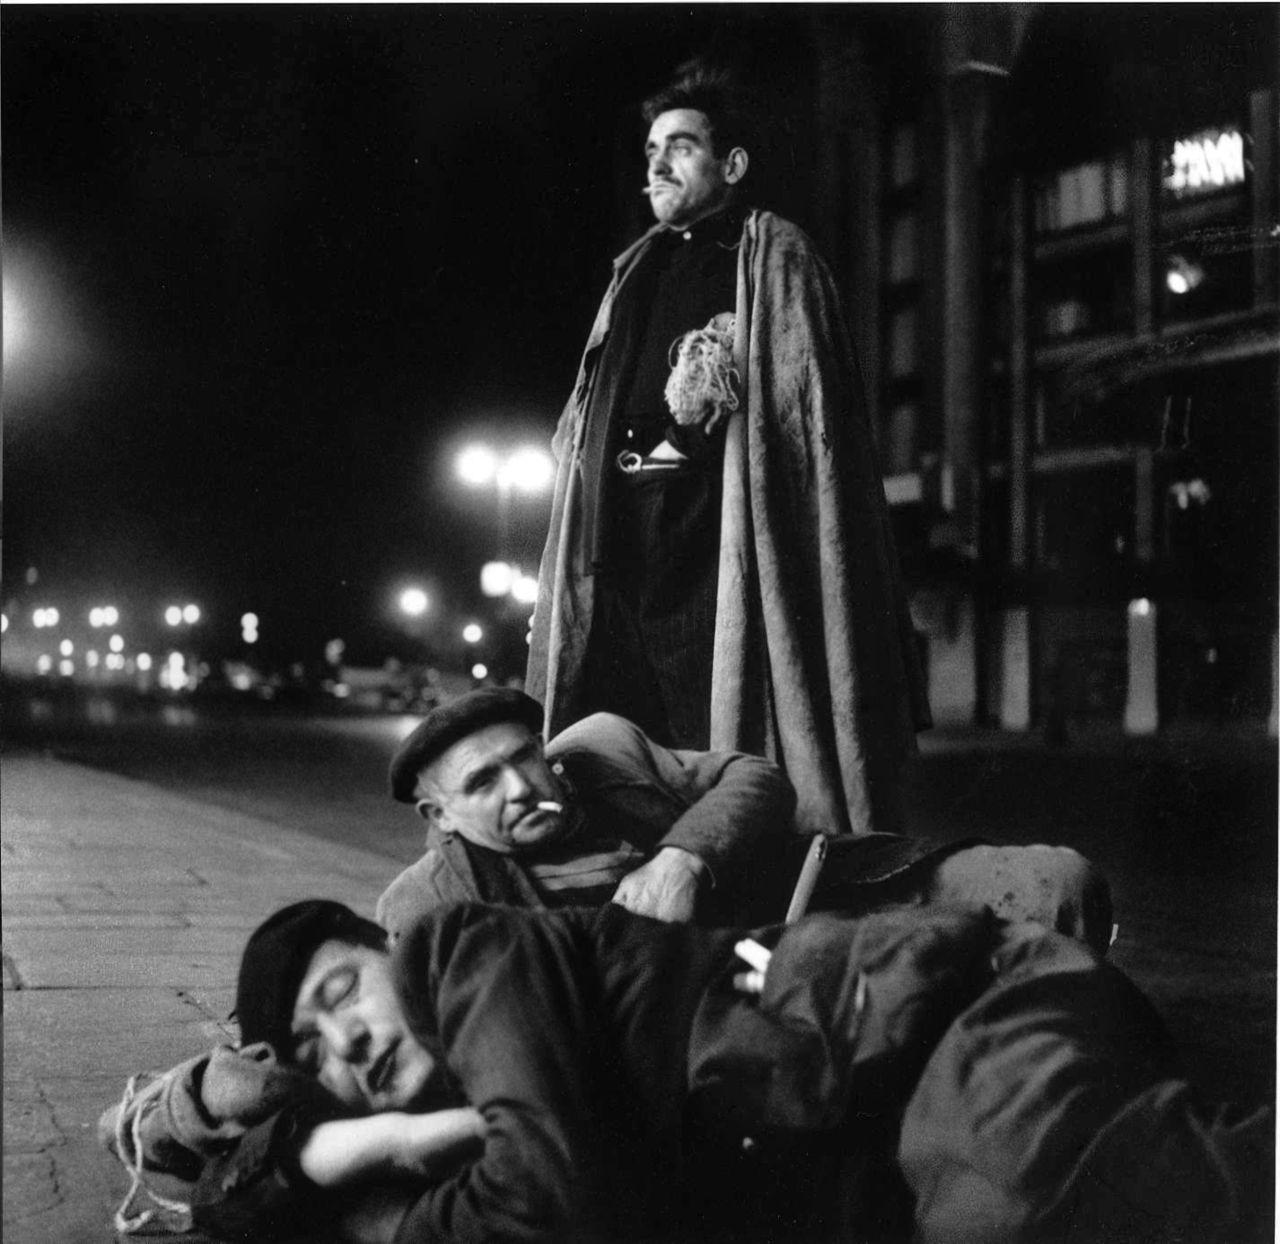 oreiller paris Robert Doisneau: Un oreiller en toile de jute, Paris, 1952  oreiller paris